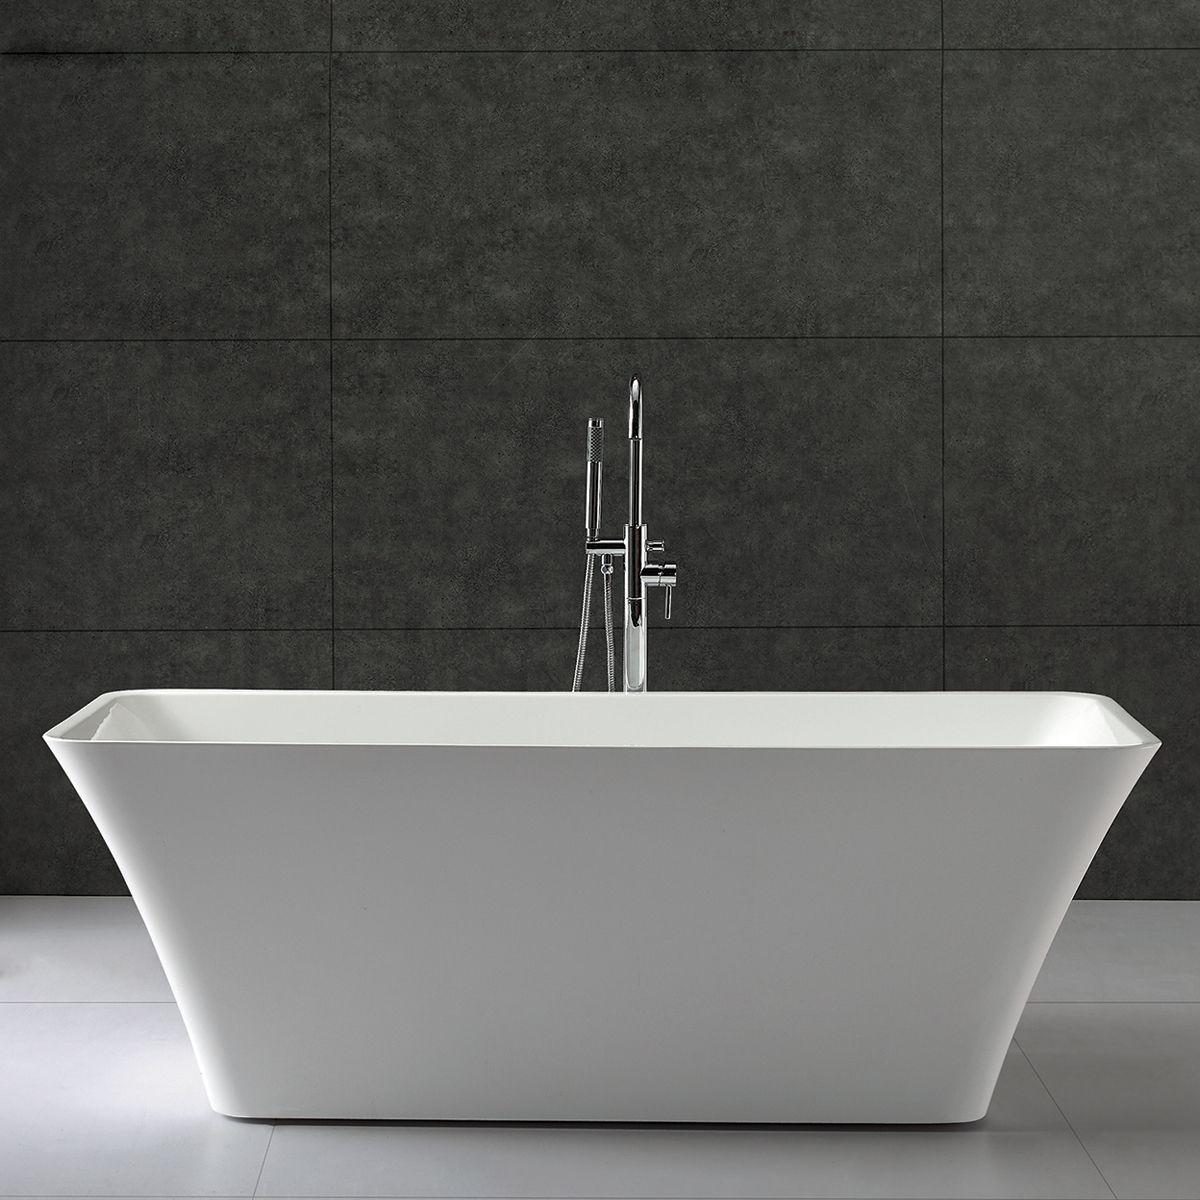 Jade Bath BLW1820 French Riviera Claire Freestanding Soaker Tub ...